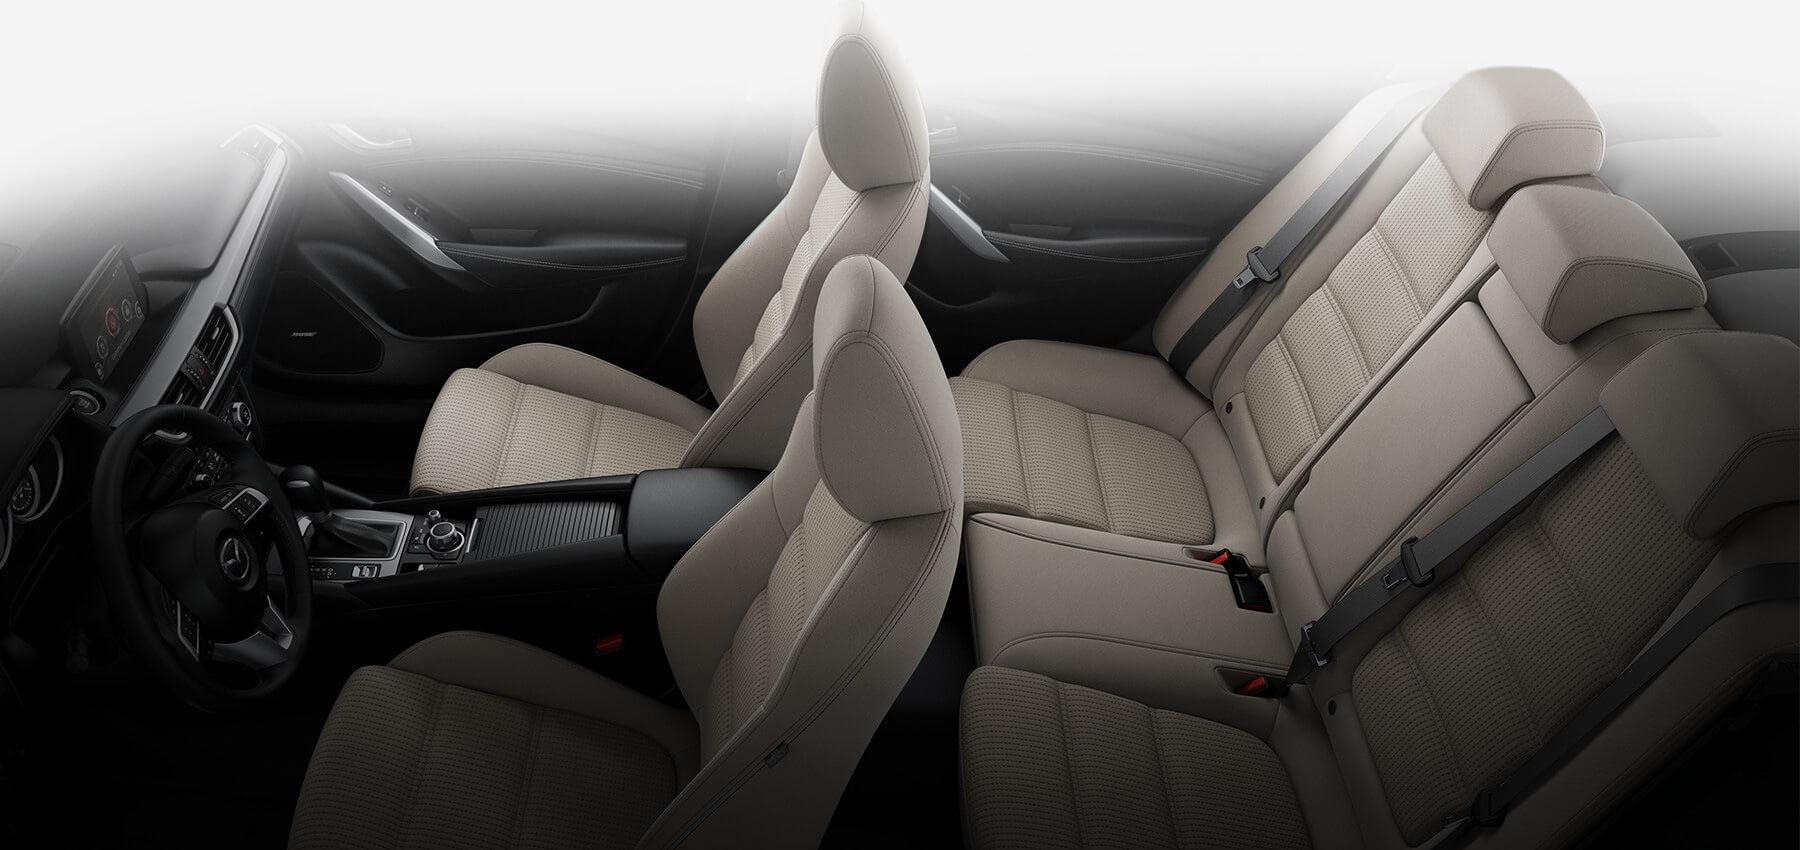 2017 Mazda6, Sand Cloth